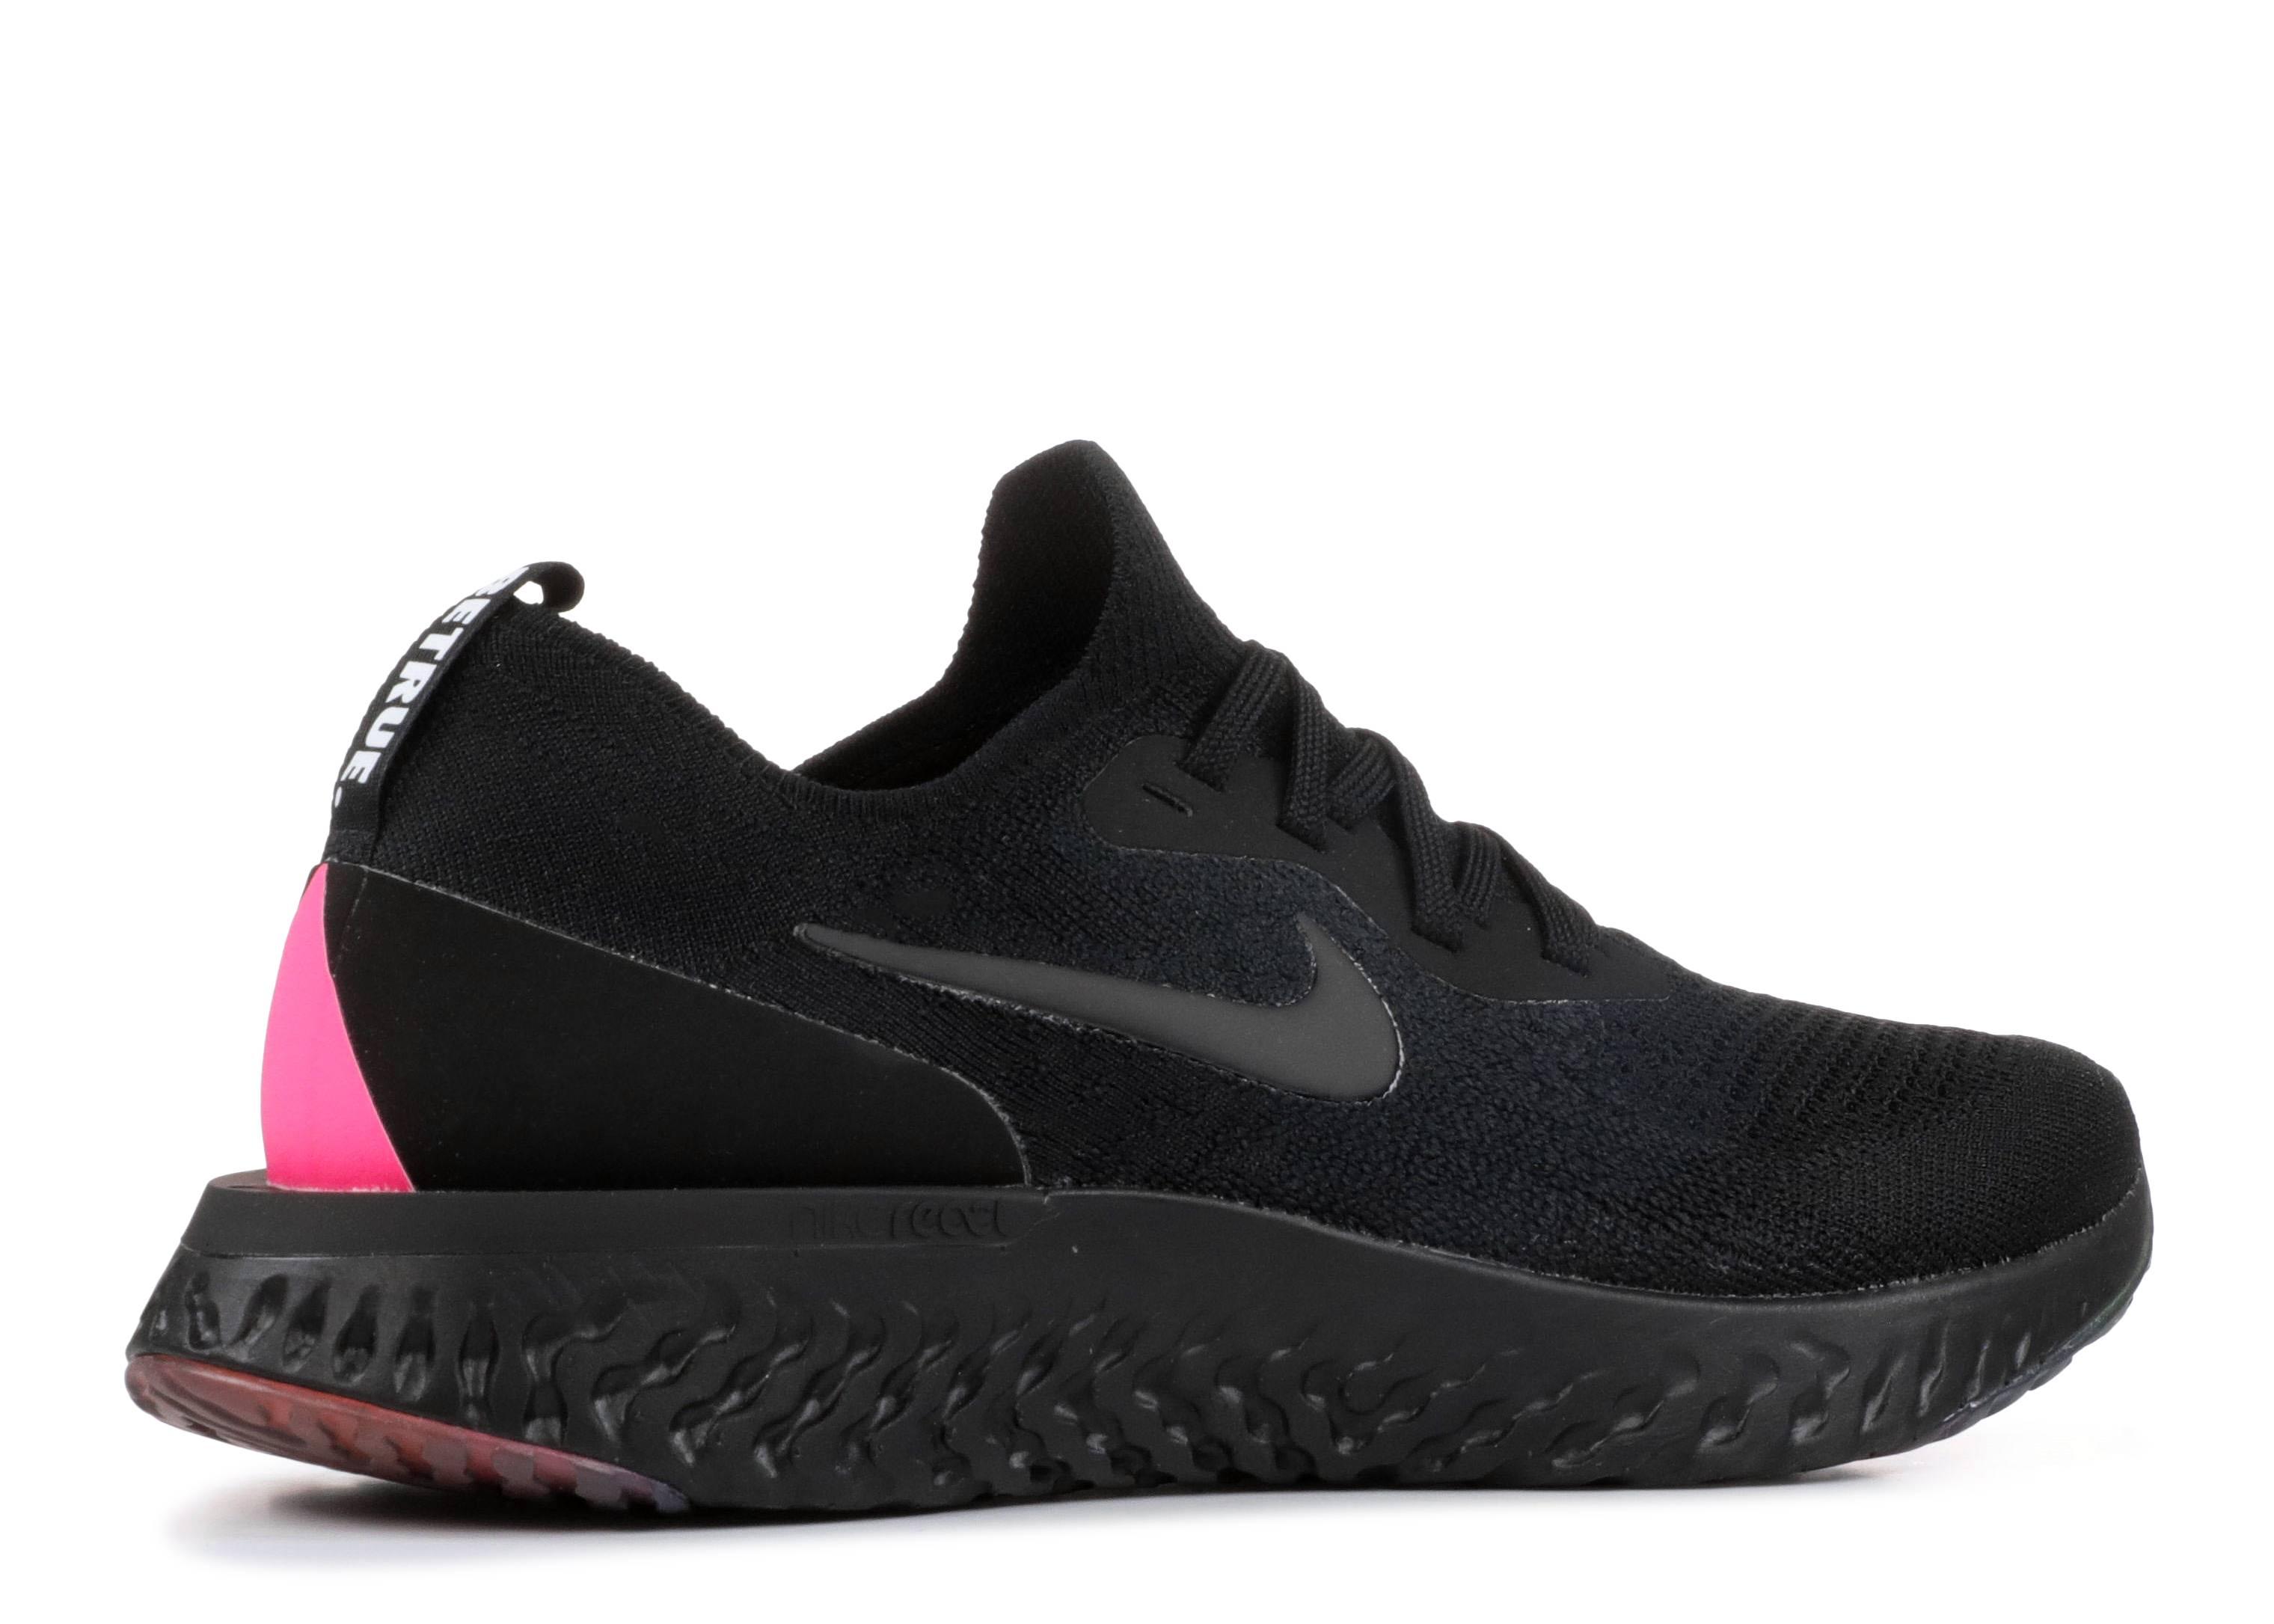 Nike Epic React Flyknit Betrue - Nike - AR3772 001 - black black - pink  blast  9a4e24bef